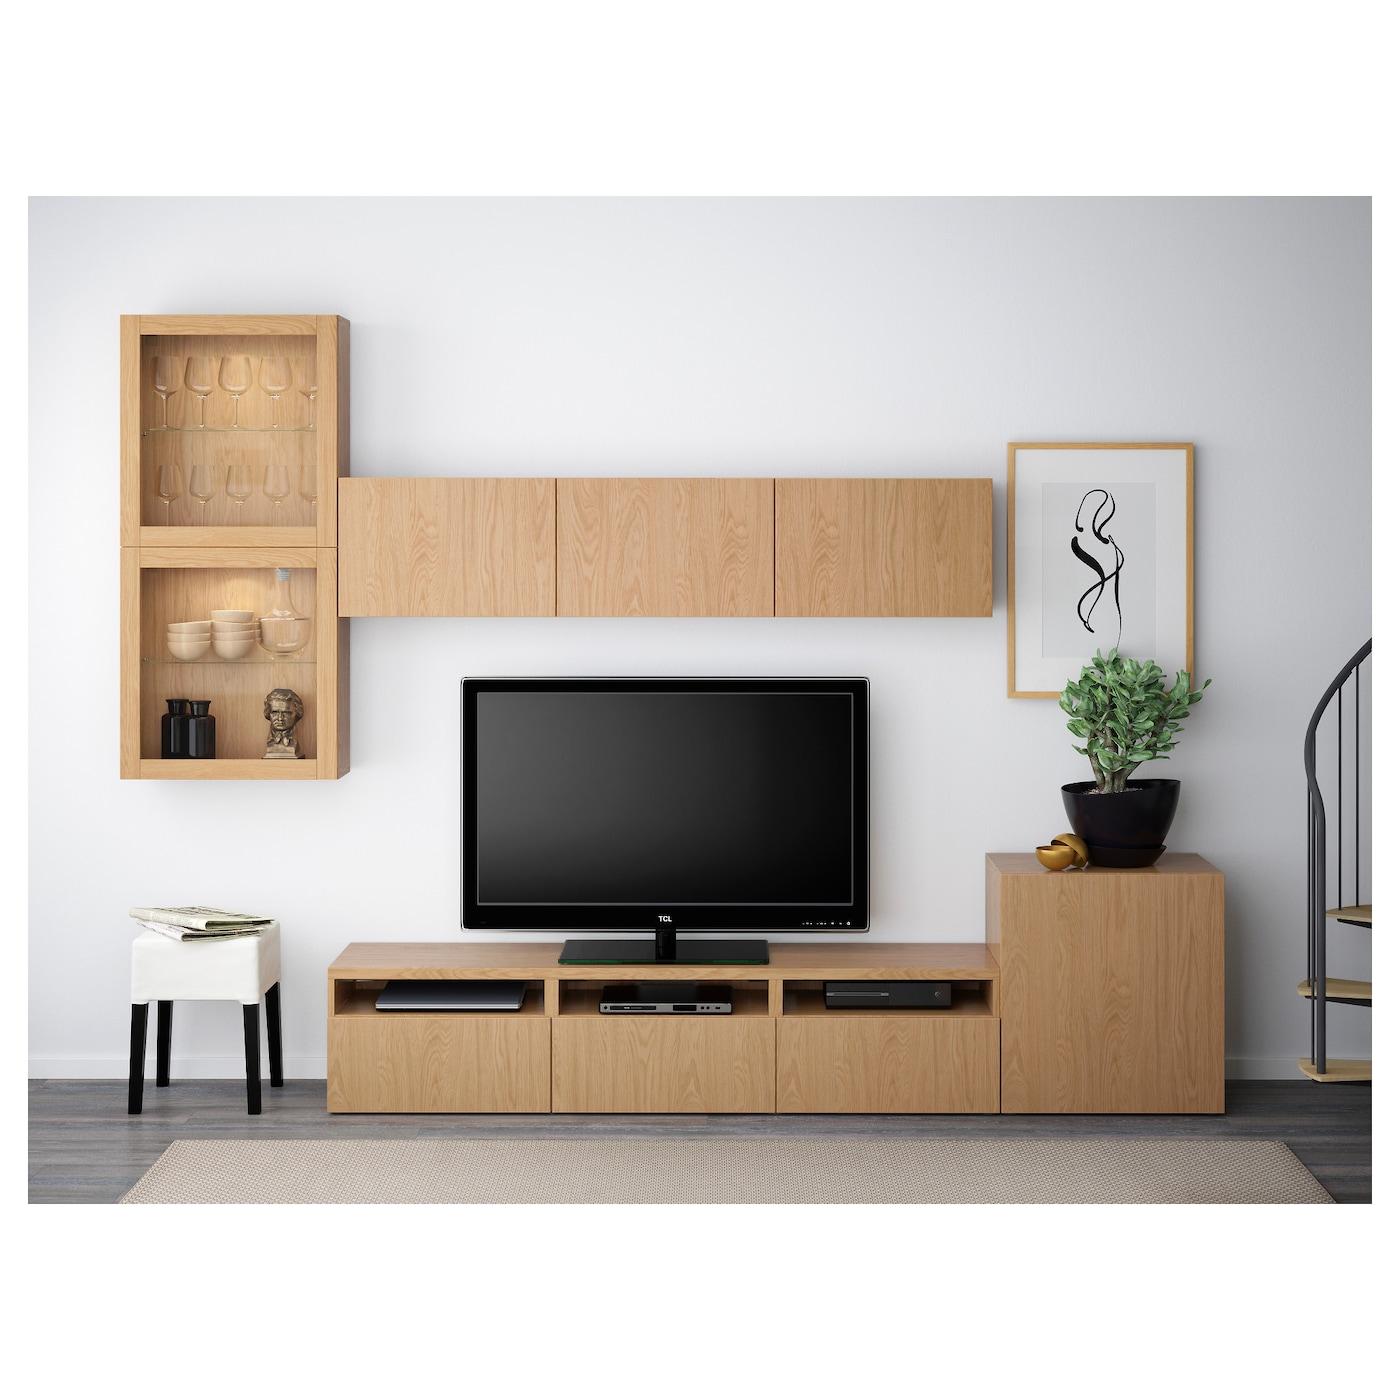 Wandmeubel Kallax Ikea.Bnk Svart Top Amazing Amazing Perfect Best Tv Storage Doors